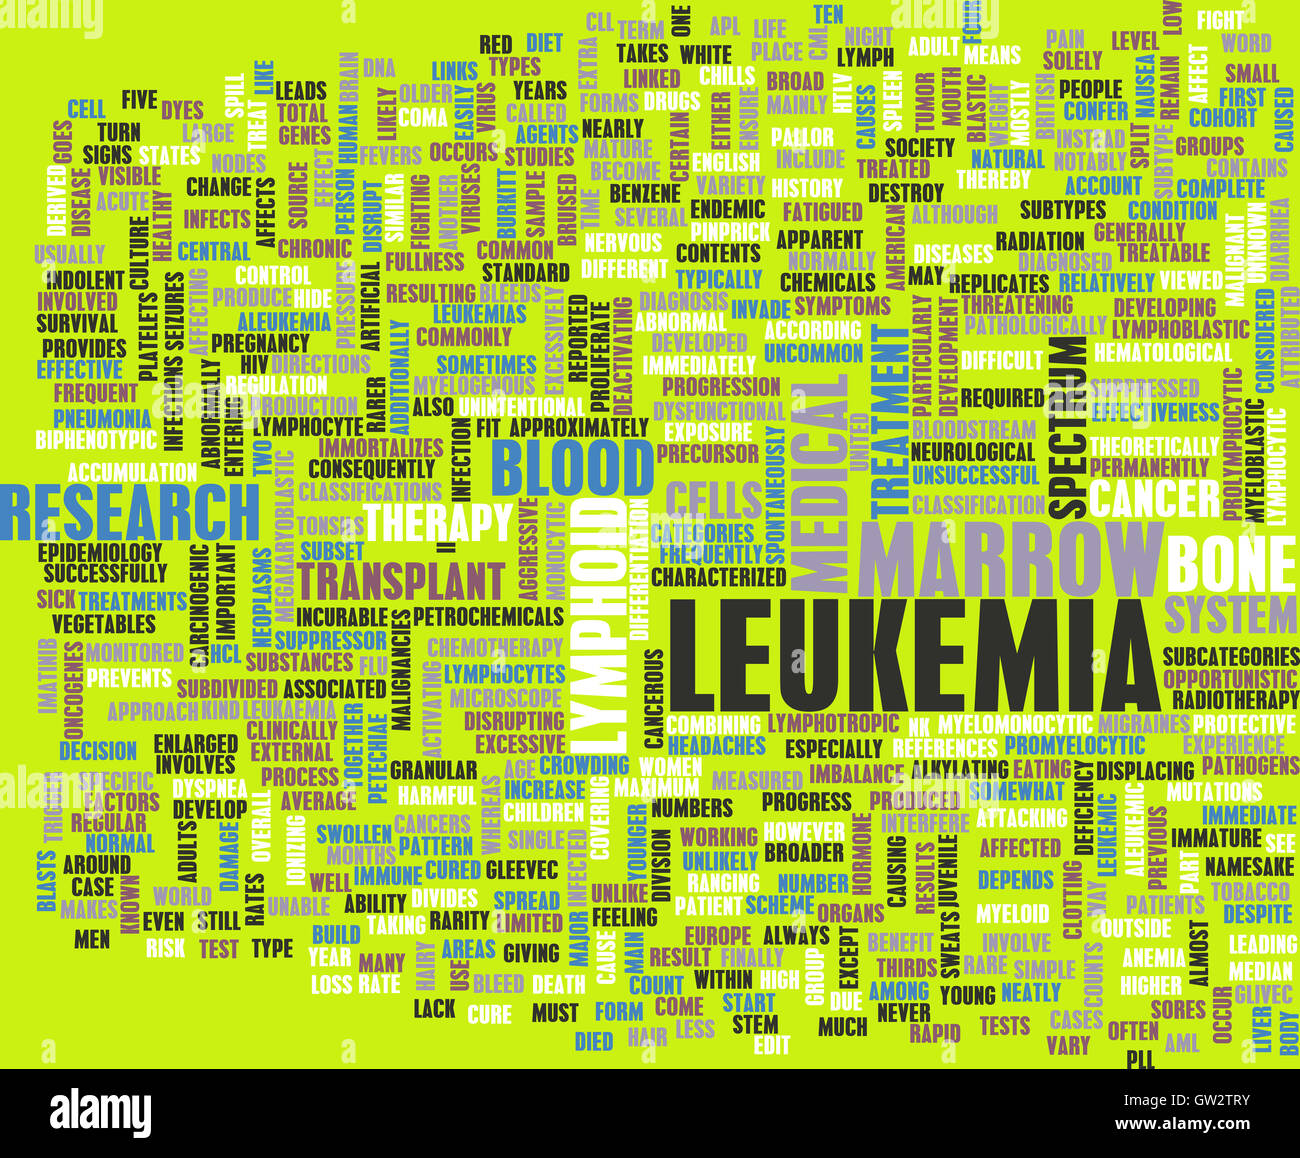 Leukemia - Stock Image